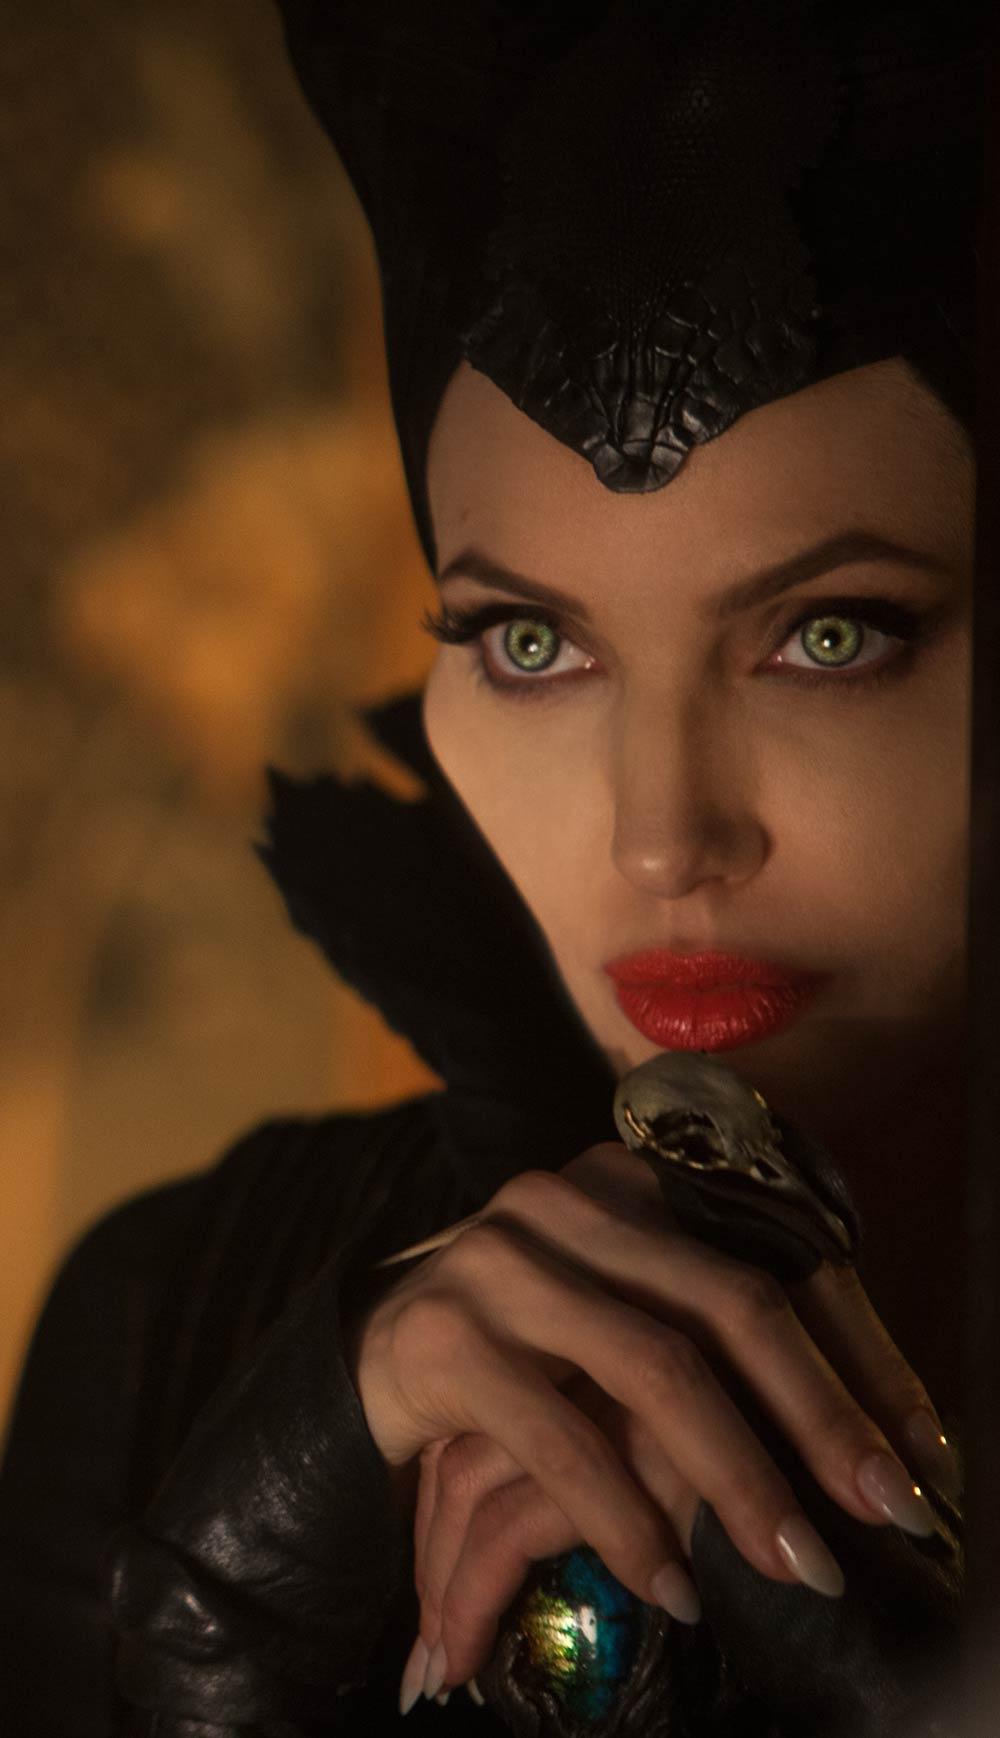 Angelina Jolie Foto Malfica 82 De 104